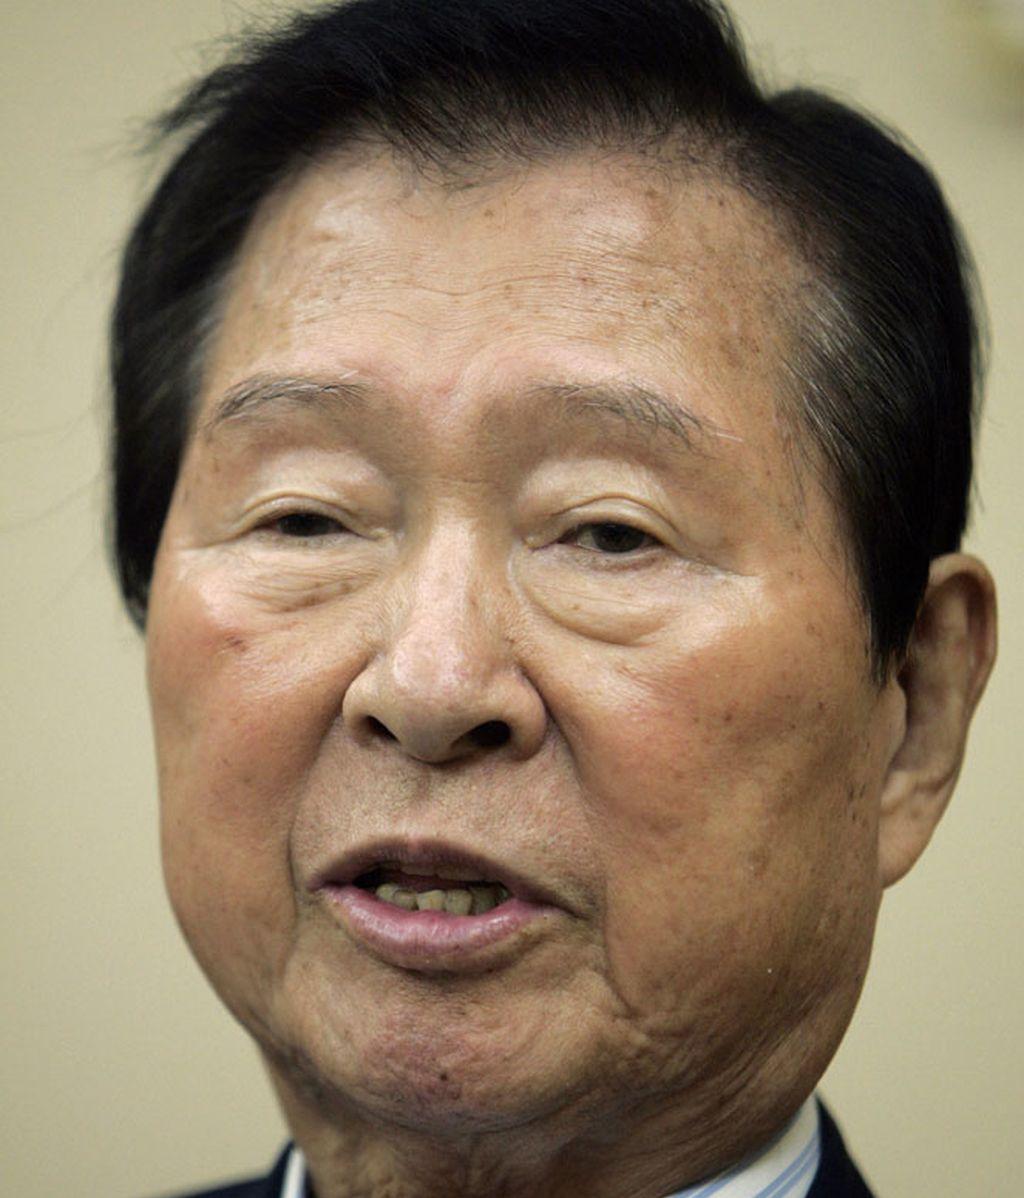 El ex presidente surcoreano Kim Dae Jung